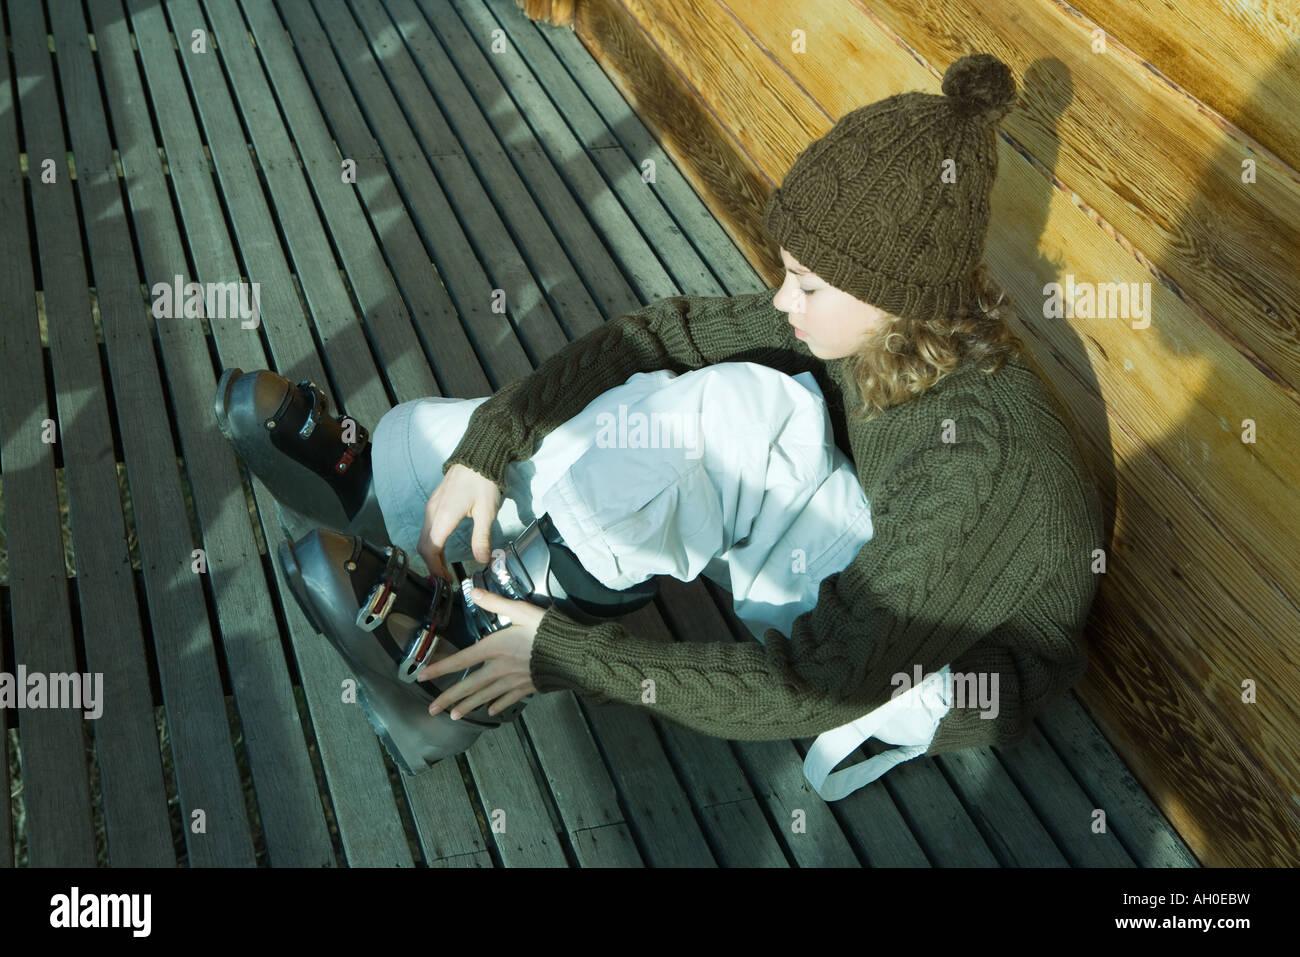 Teenage girl sitting on ground, putting on ski boot - Stock Image